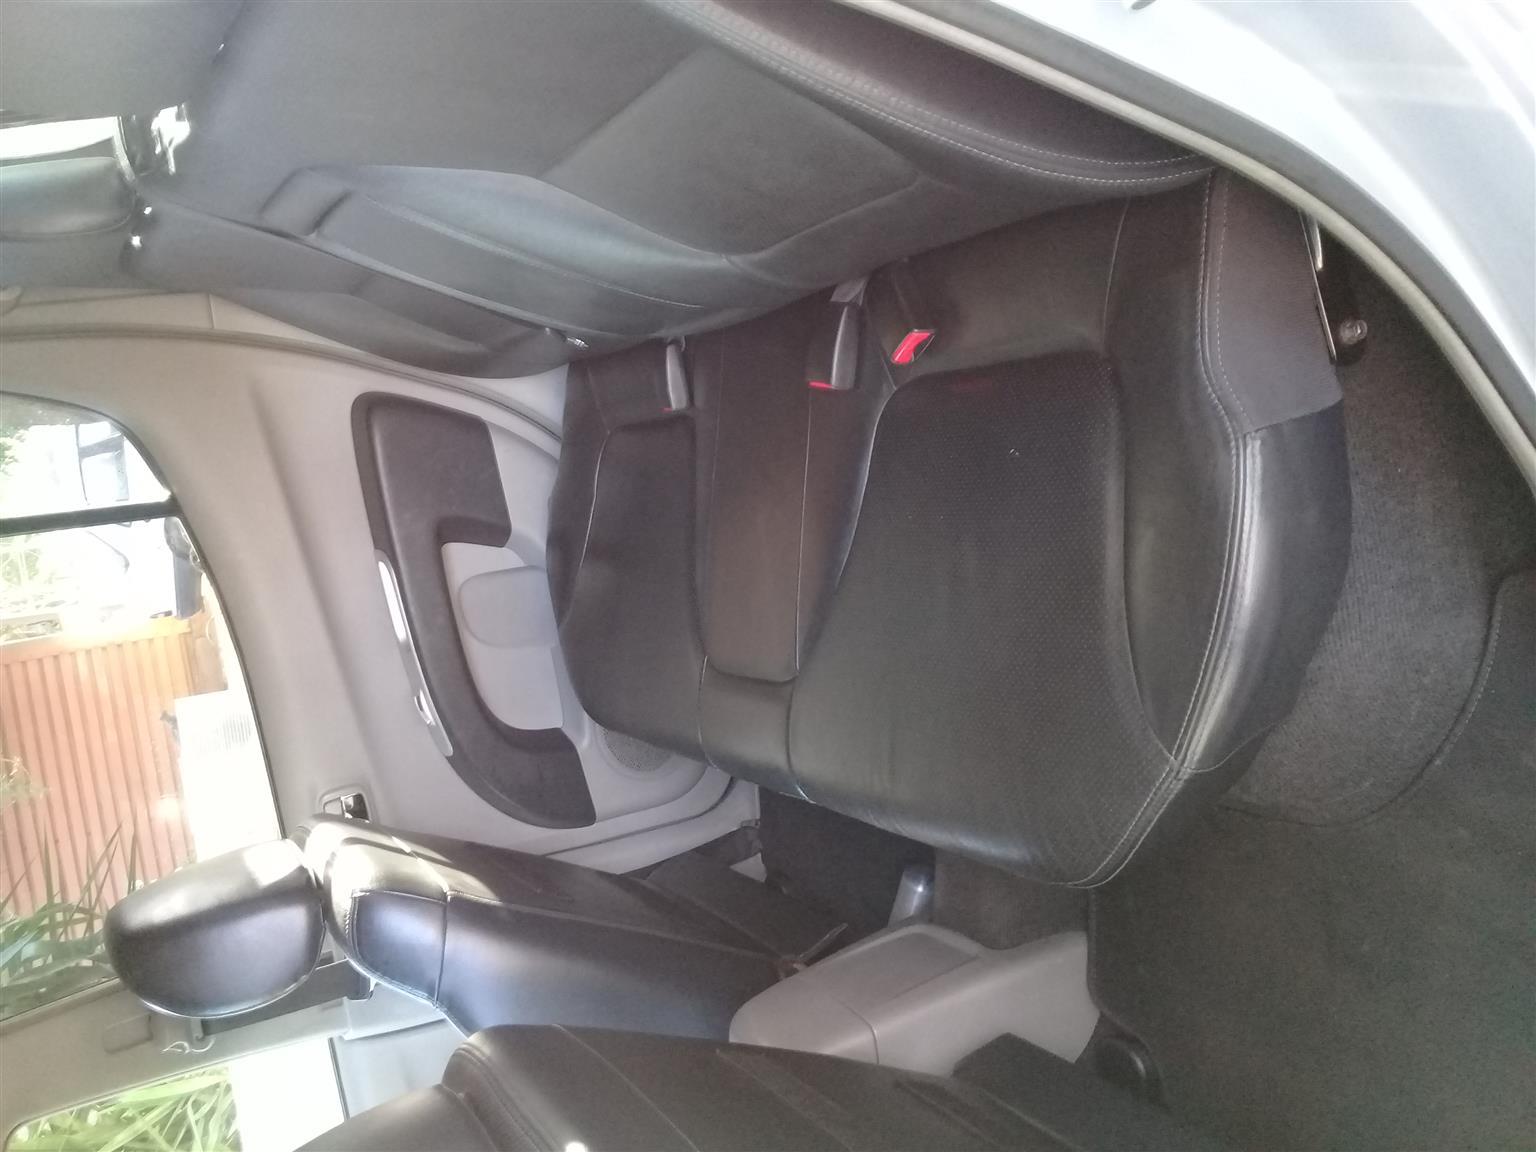 2009 Mitsubishi Triton 3.5 V6 4x4 double cab